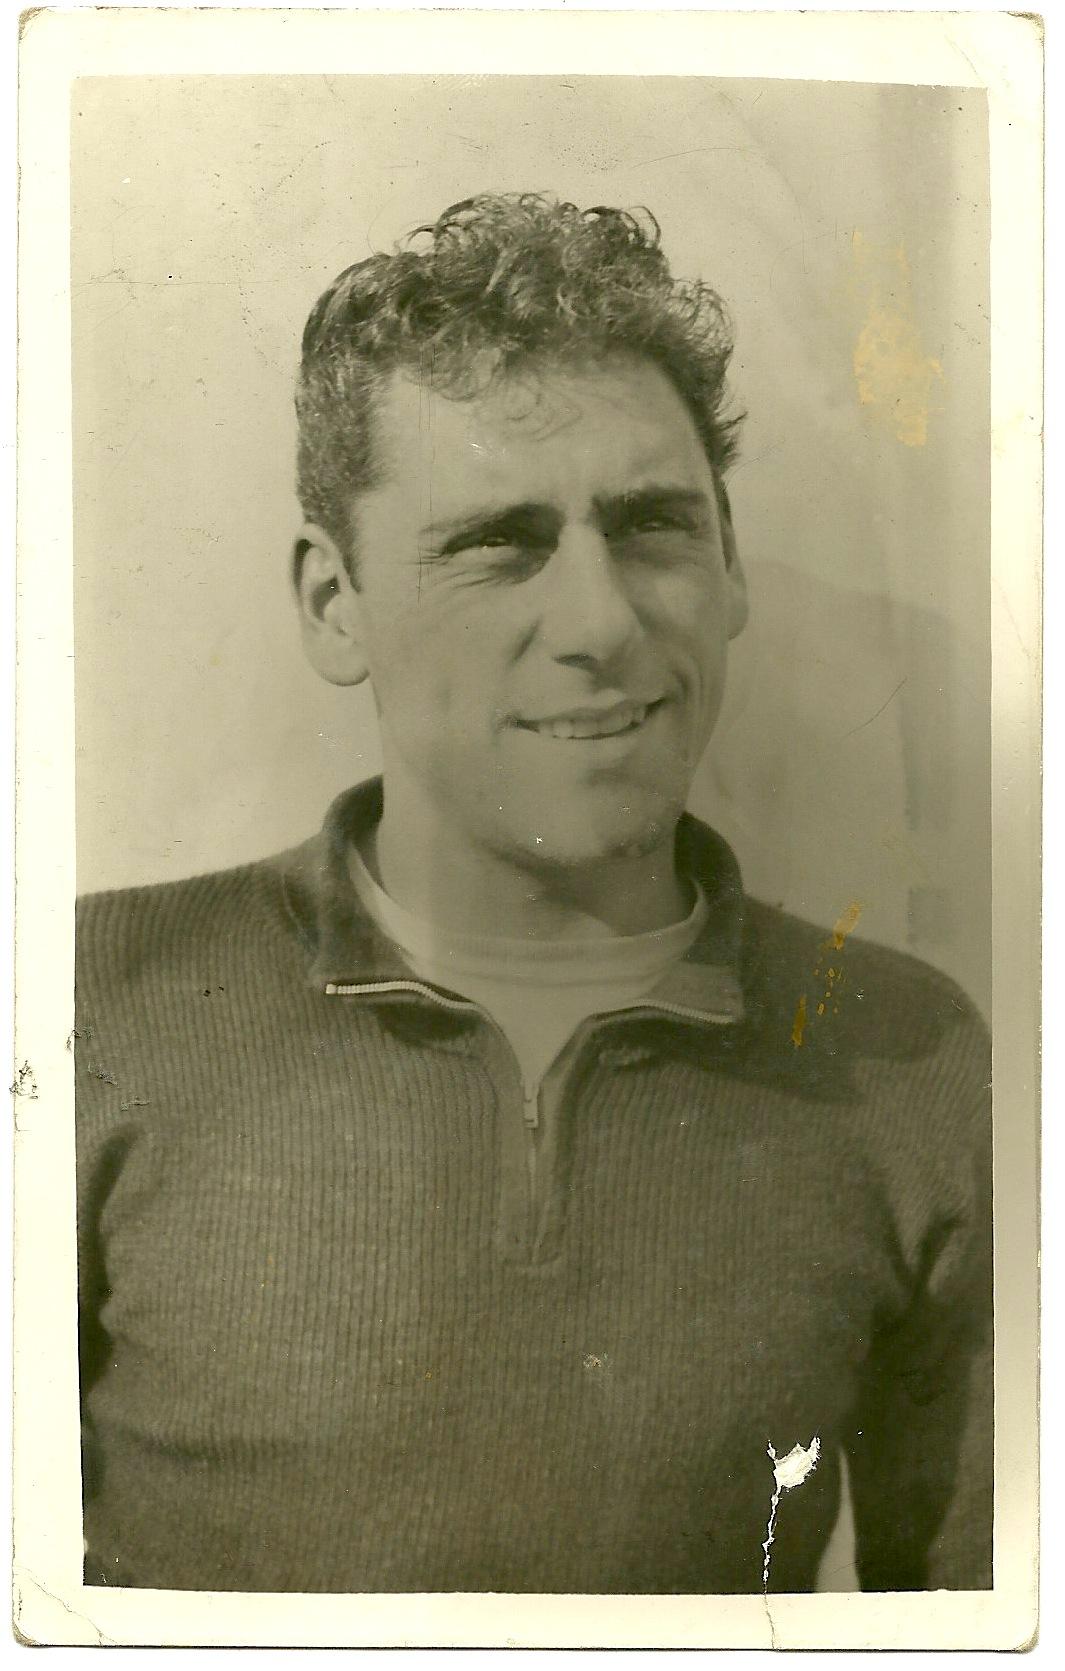 The Shipping Forcast: Harry Stedman & The Cunard Yanks